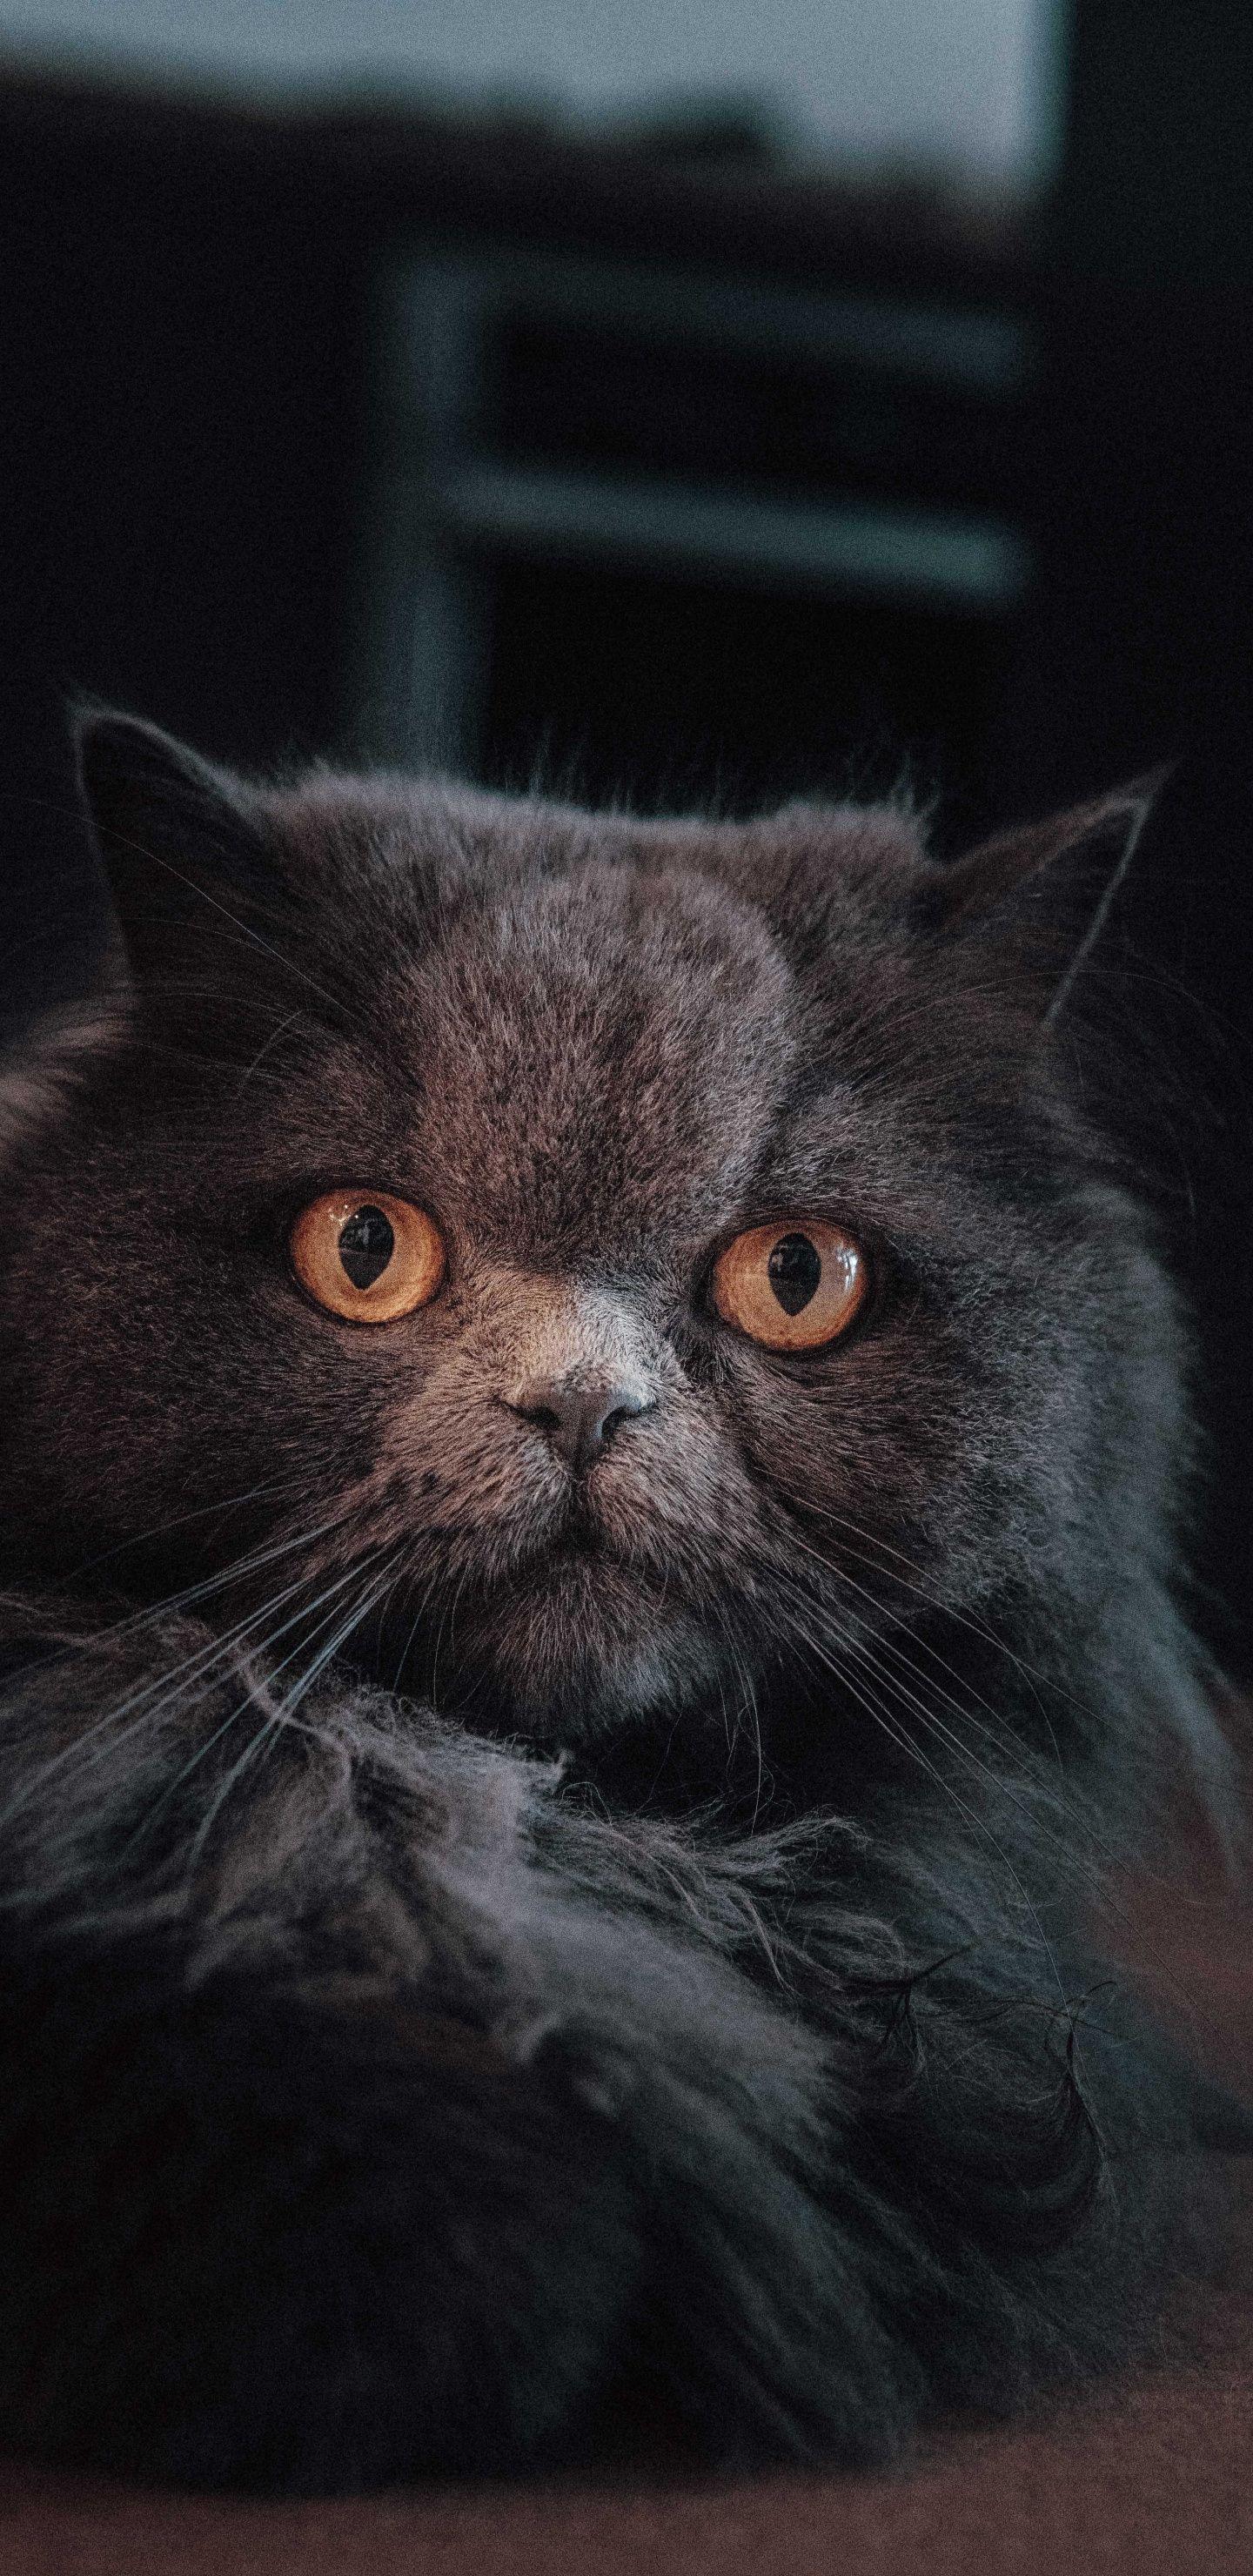 1440x2960 Curious cat, feline, yellow eyes, fluffy animal